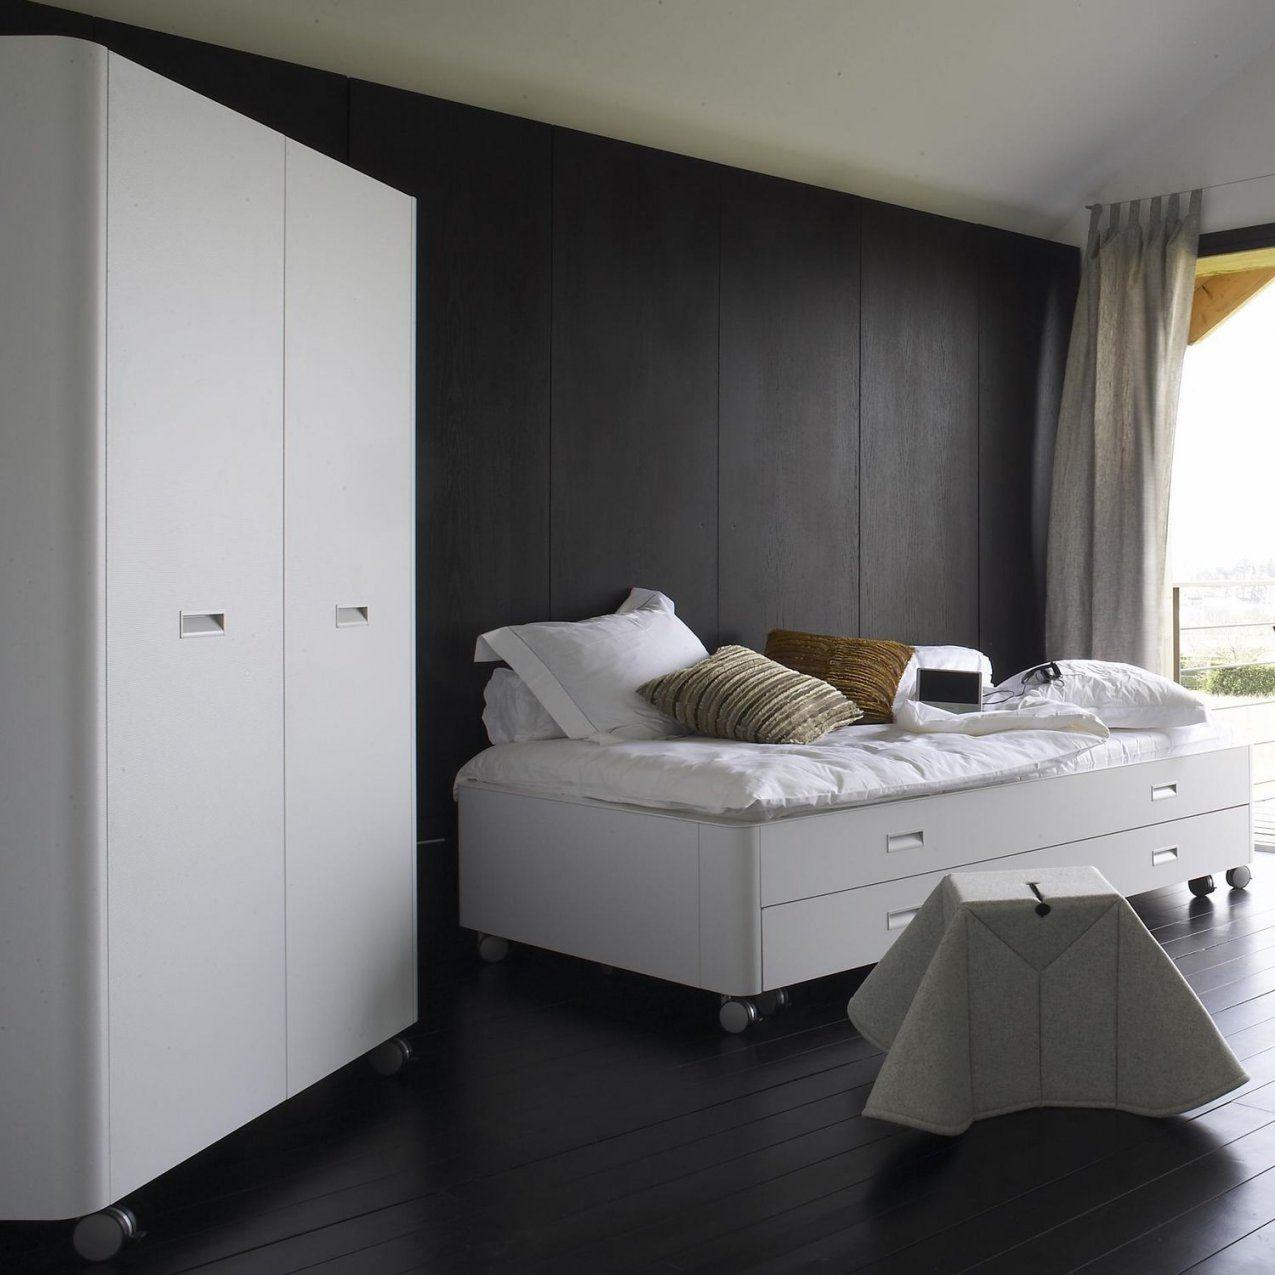 Single Bed  Contemporary  On Casters  With Drawer  Travel Studio von Ligne Roset Travel Studio Photo